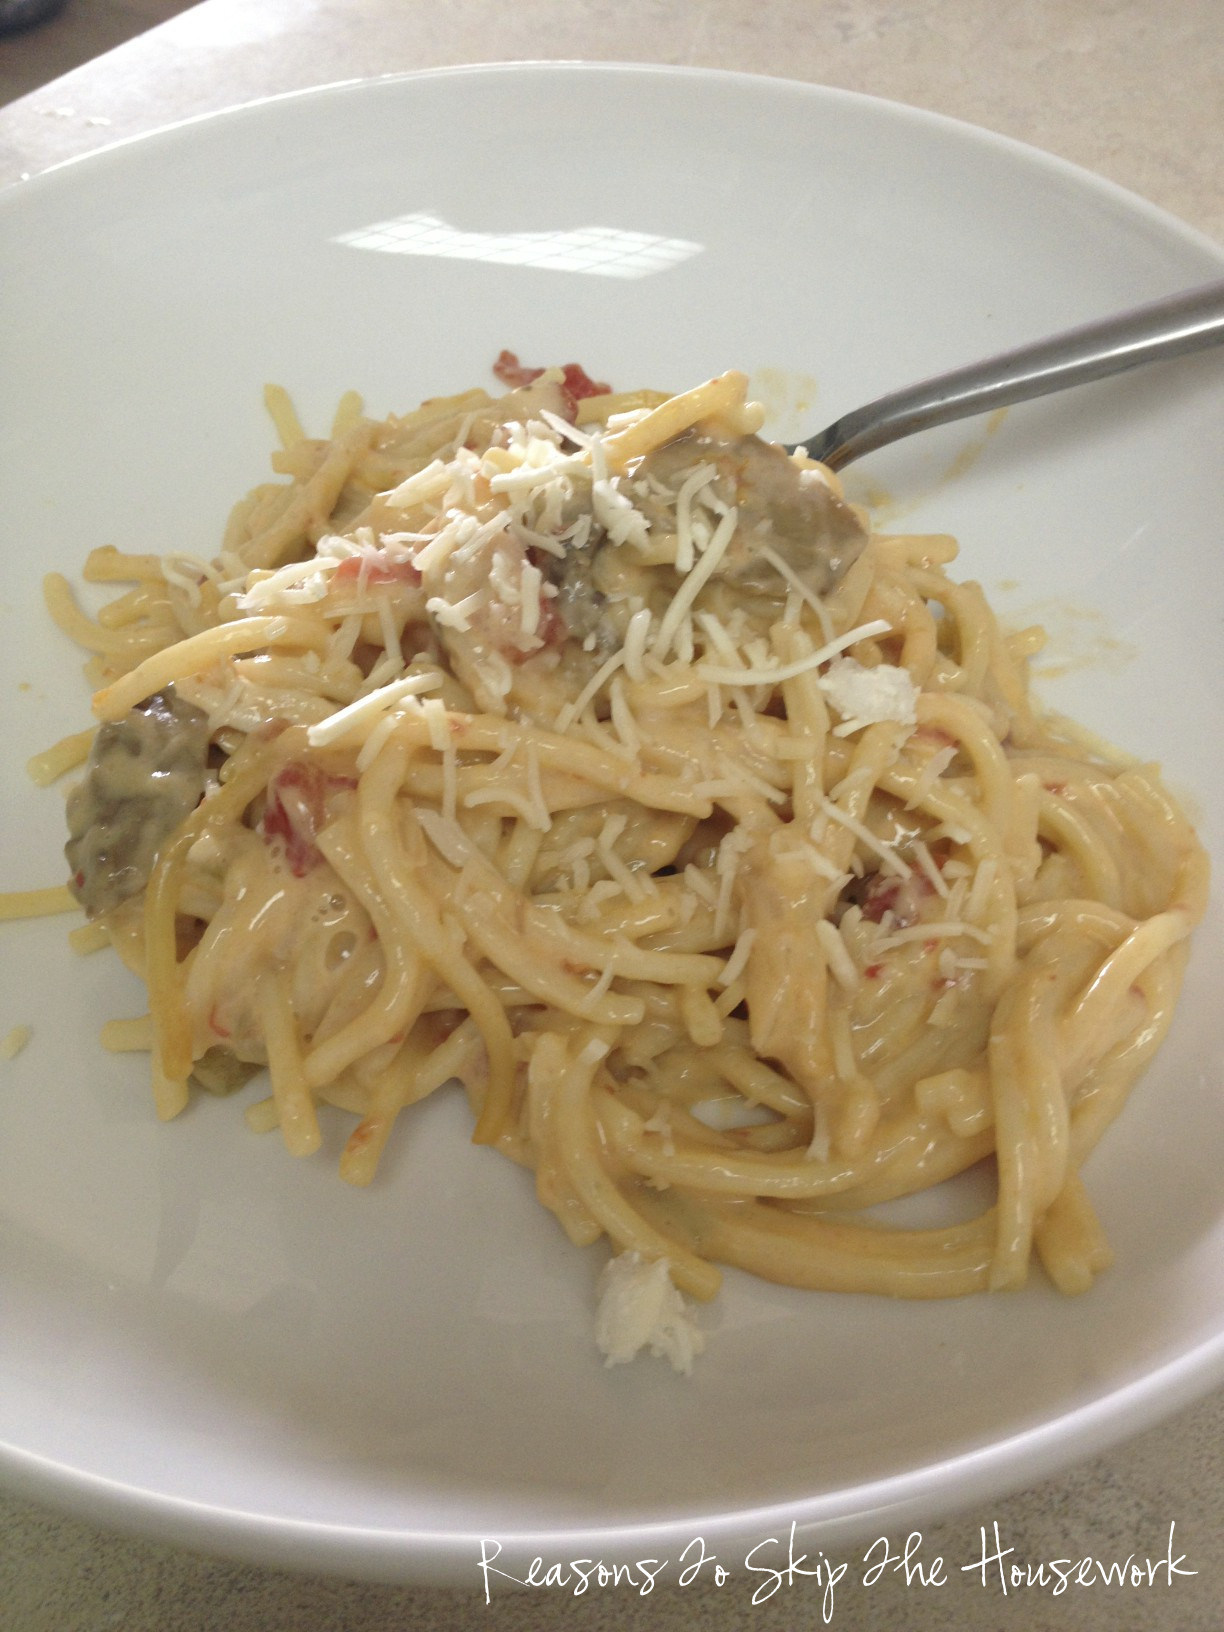 Crock Pot Chicken Spaghetti  Crockpot Chicken Spaghetti with Velveeta Skip The Housework